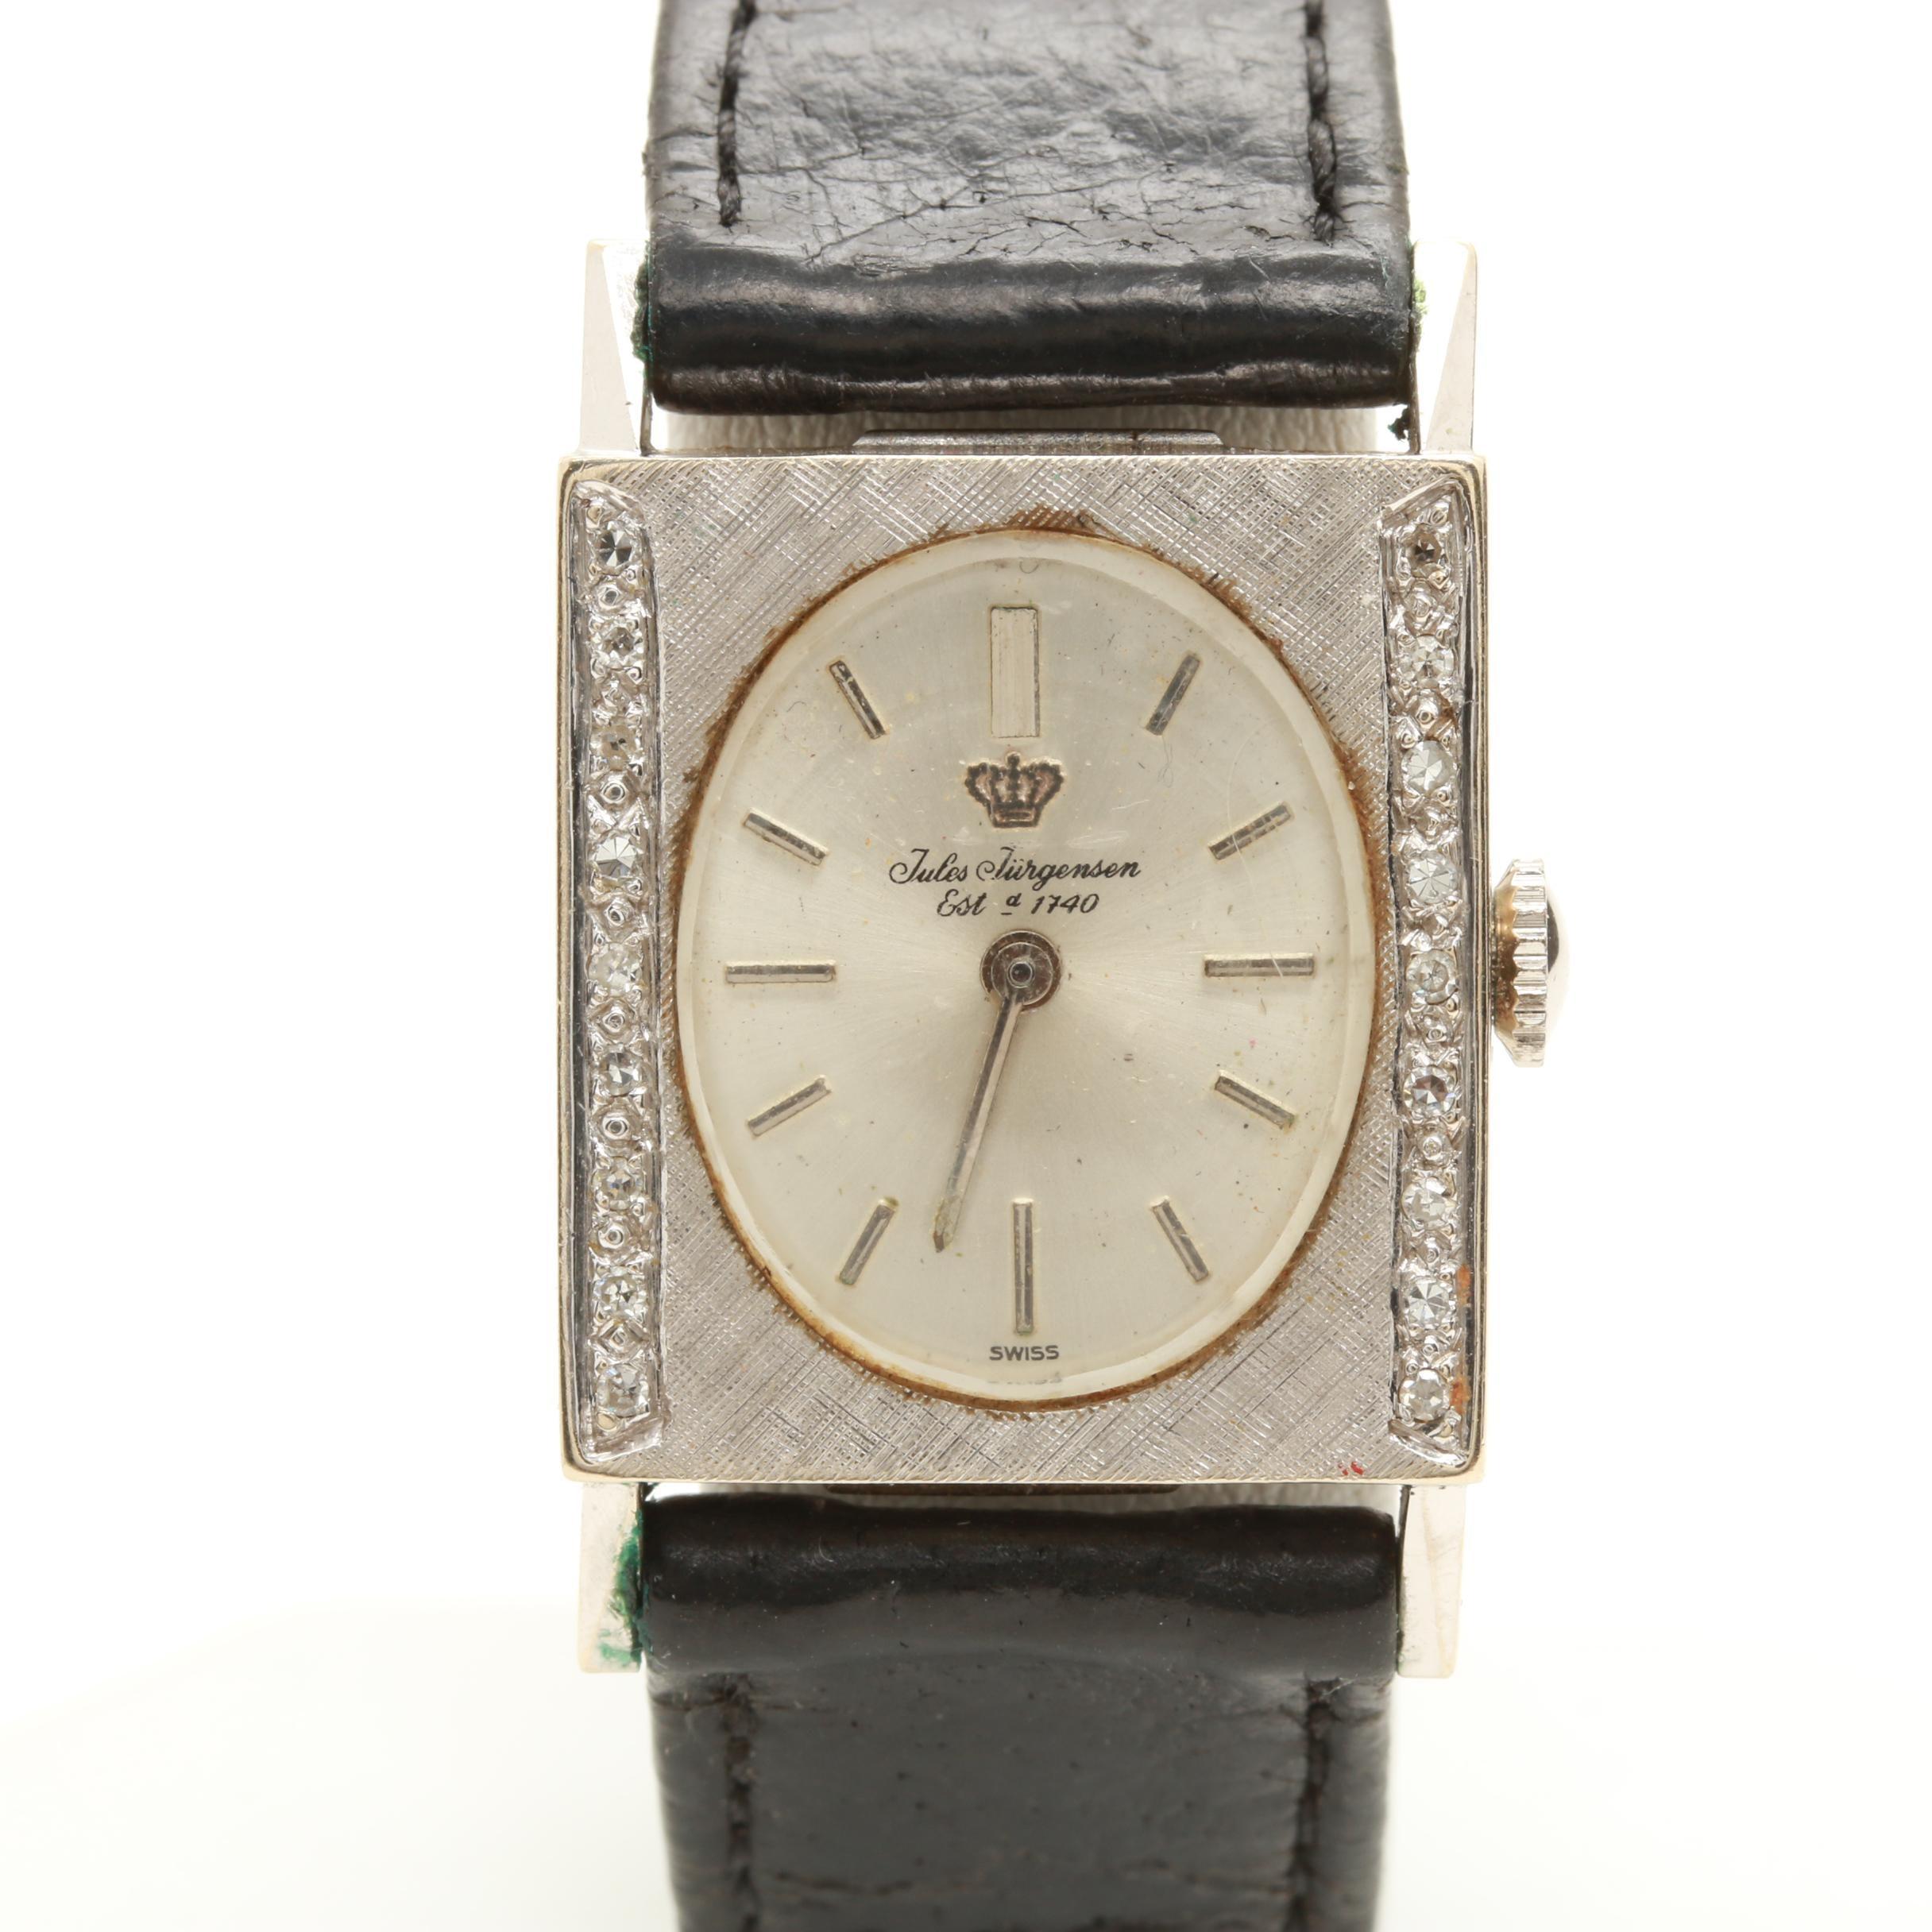 14K White Gold and Diamond Jules Jurgensen Wristwatch